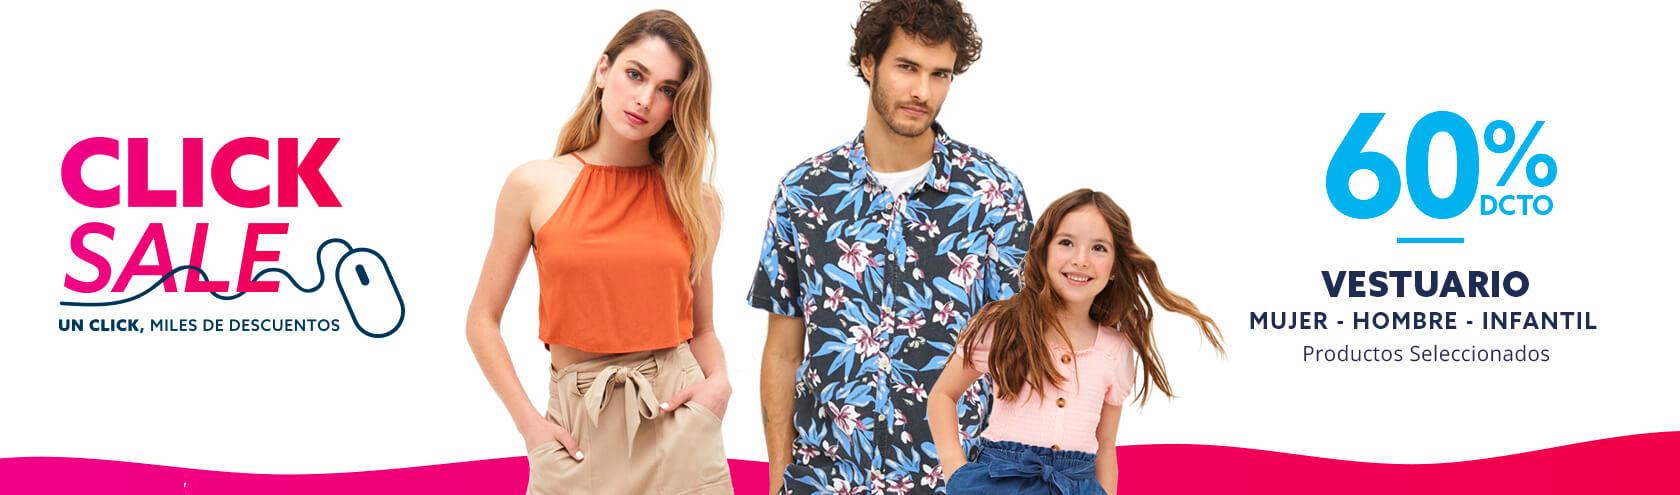 Hasta 70 porciento de descuento vestuario hombre, mujer e infantil en Click Sale paris.cl